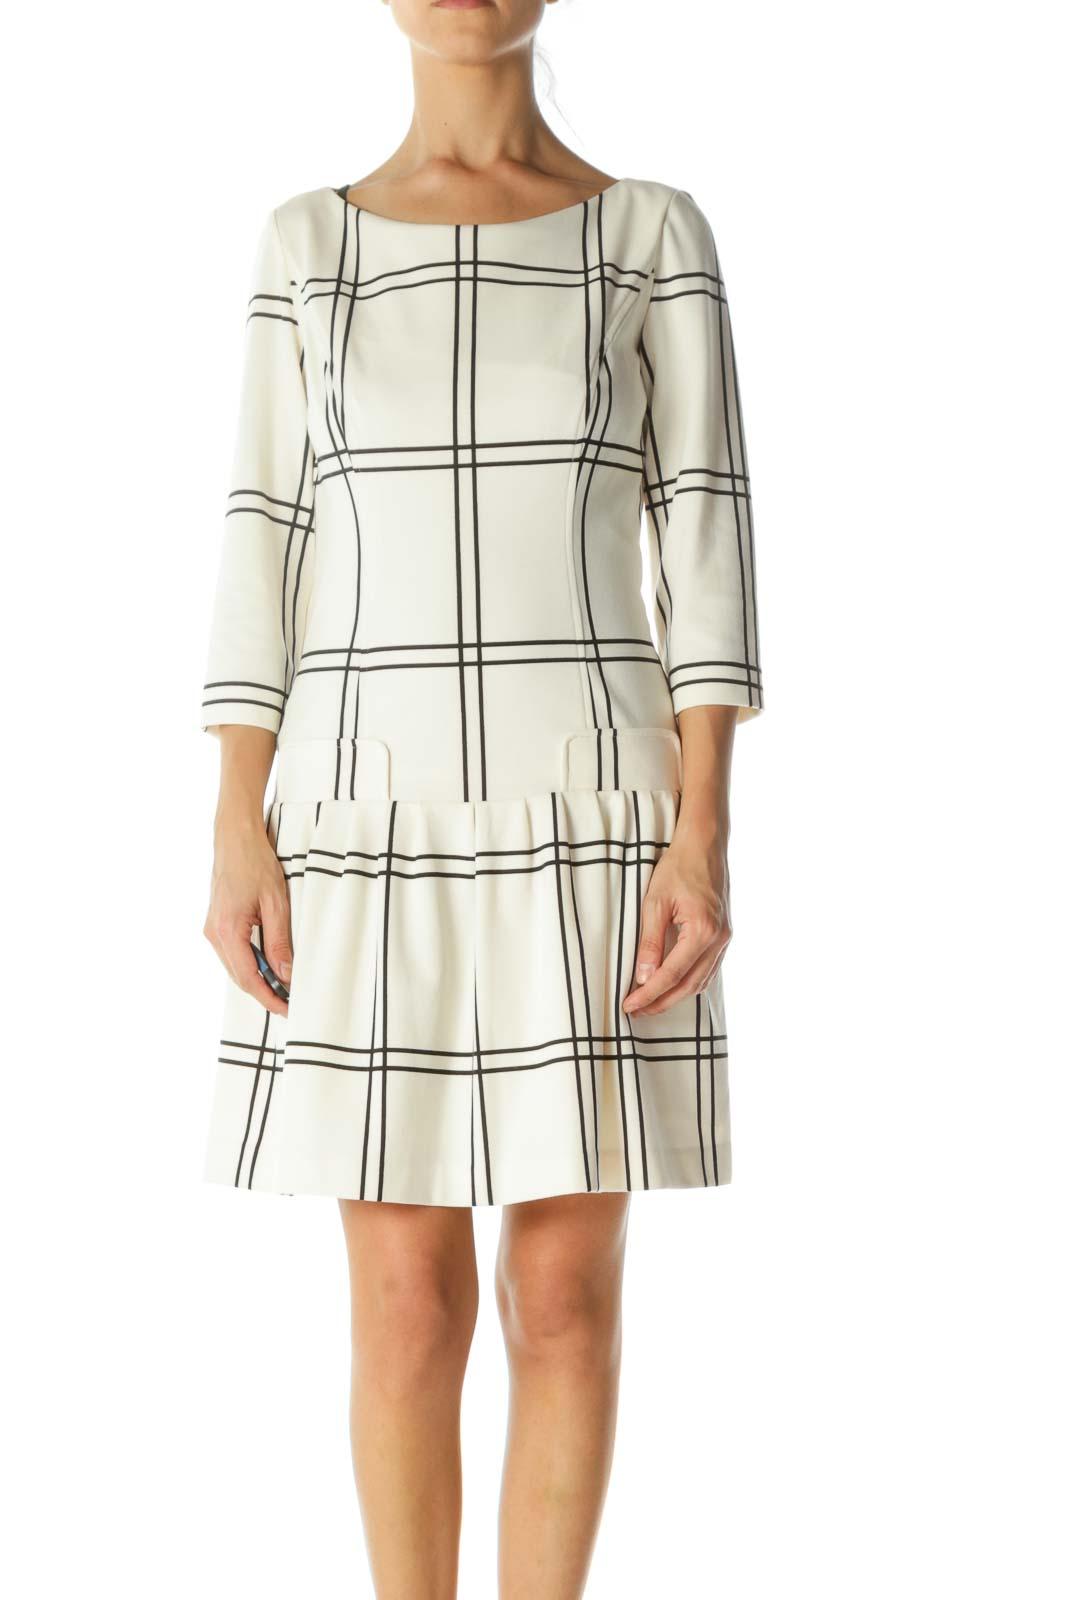 Black Cream Plaid Pleated-Skirt Long Sleeve Stretch Dress Front